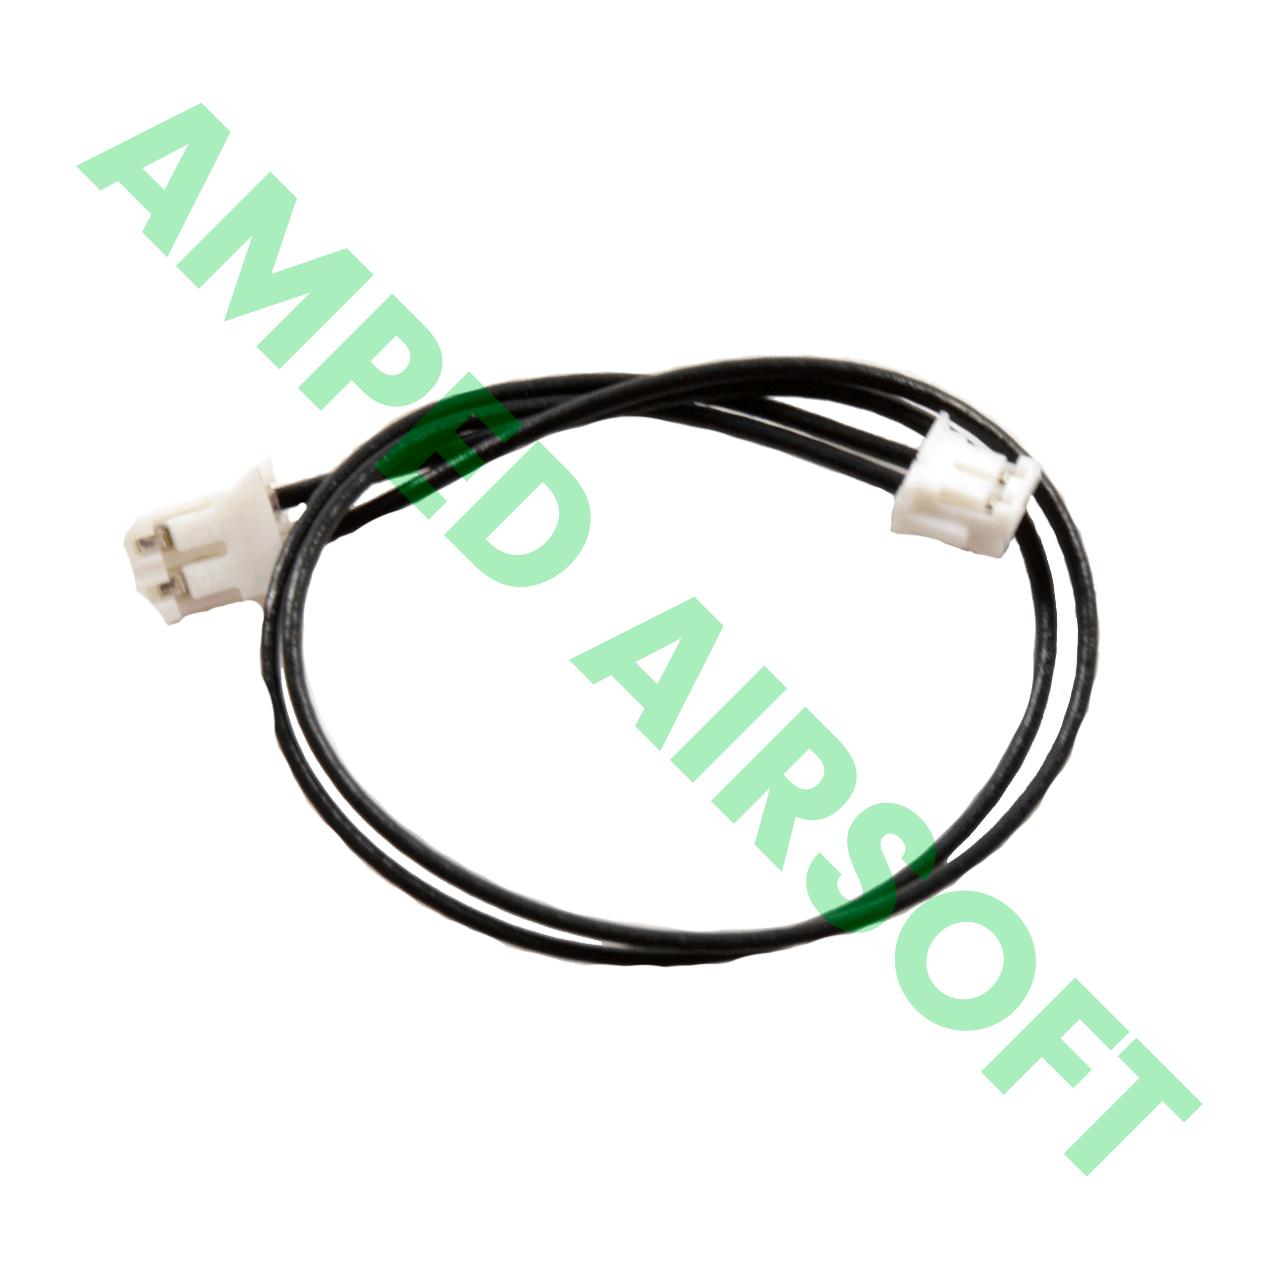 polarstar - bullet valve/solenoid wiring harness for 214/309 solenoids  (jack/